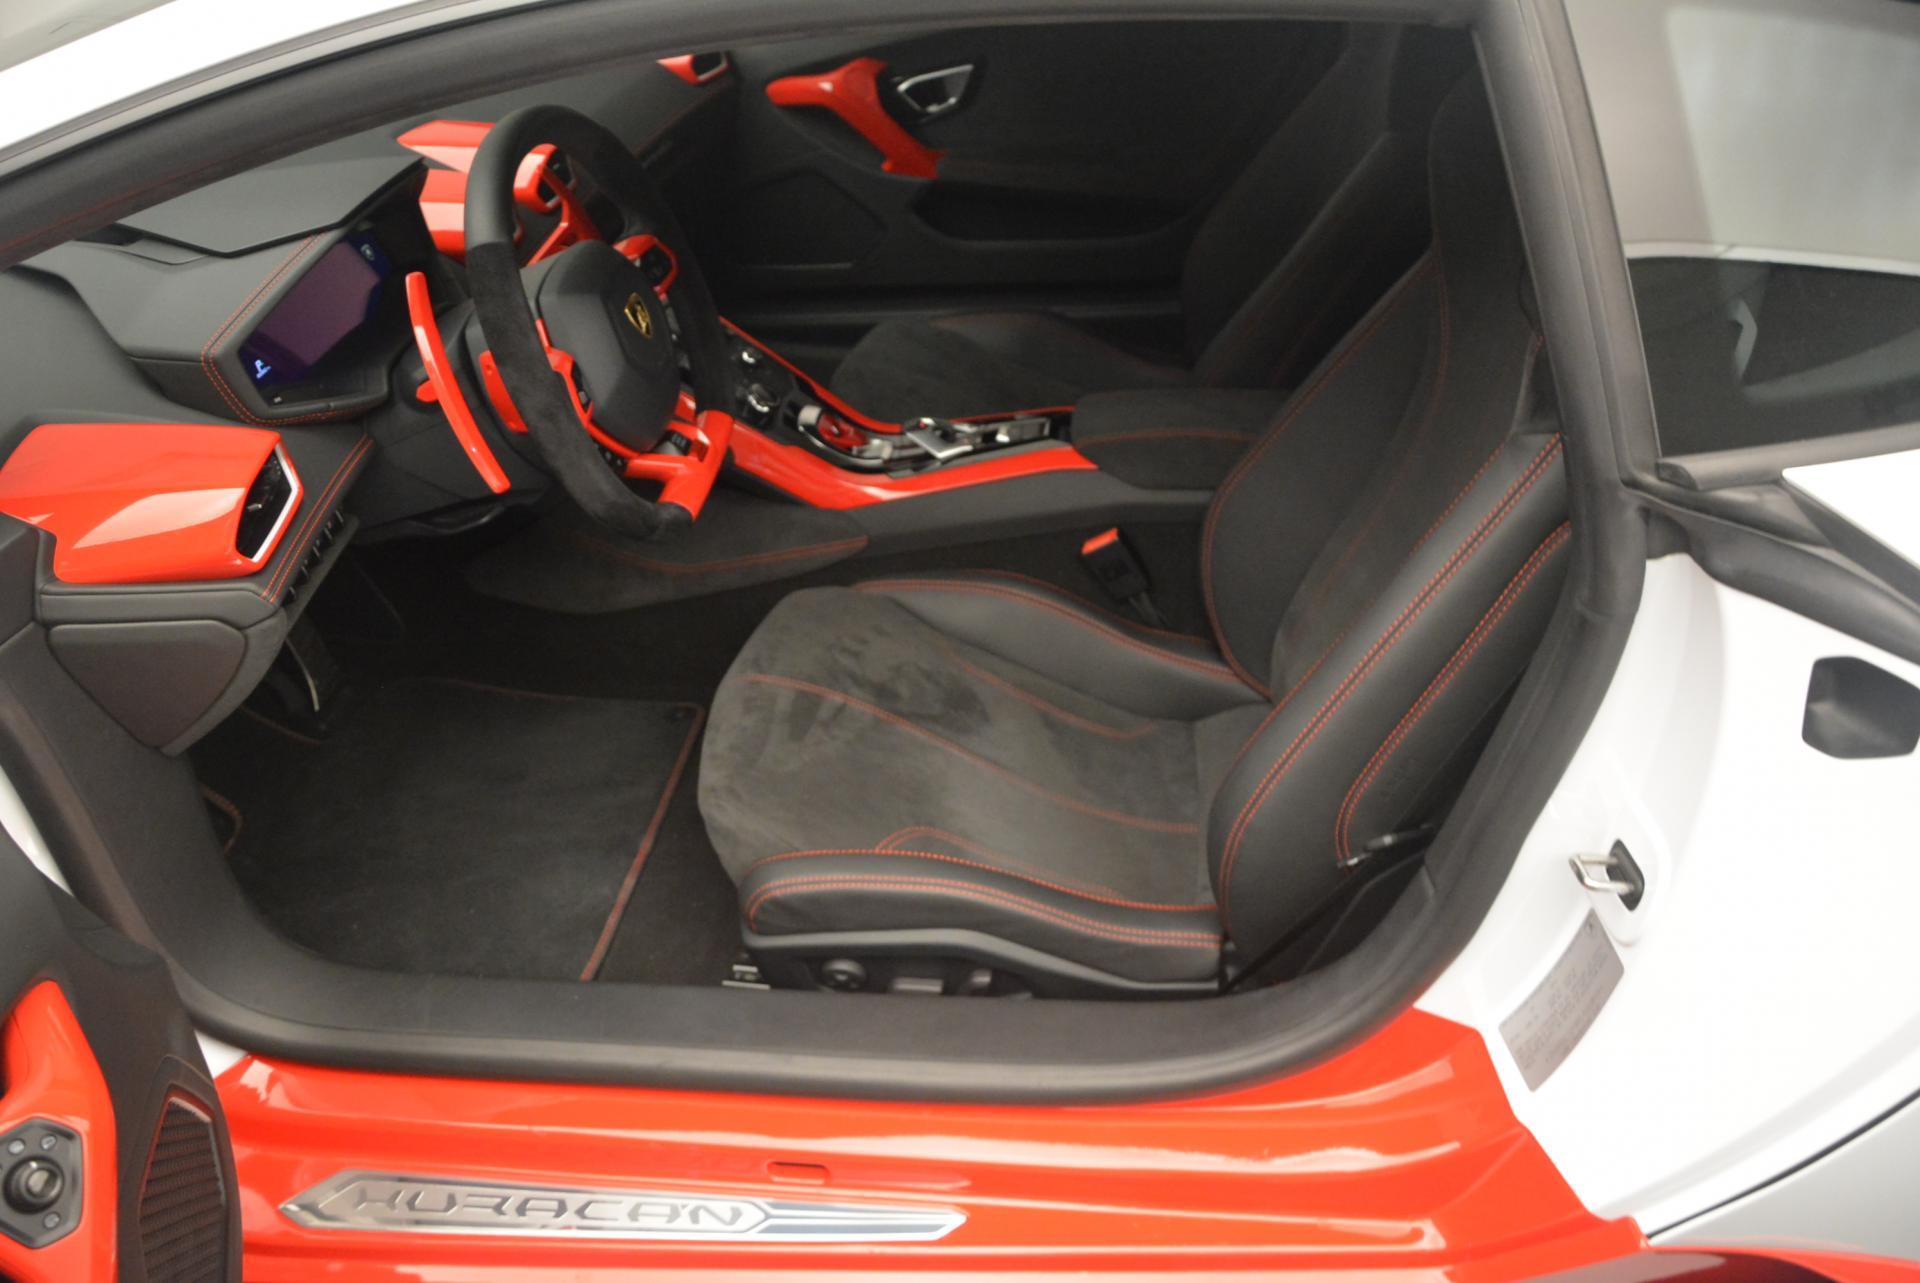 Used 2015 Lamborghini Huracan LP610-4 For Sale In Greenwich, CT. Alfa Romeo of Greenwich, F1707A 114_p15